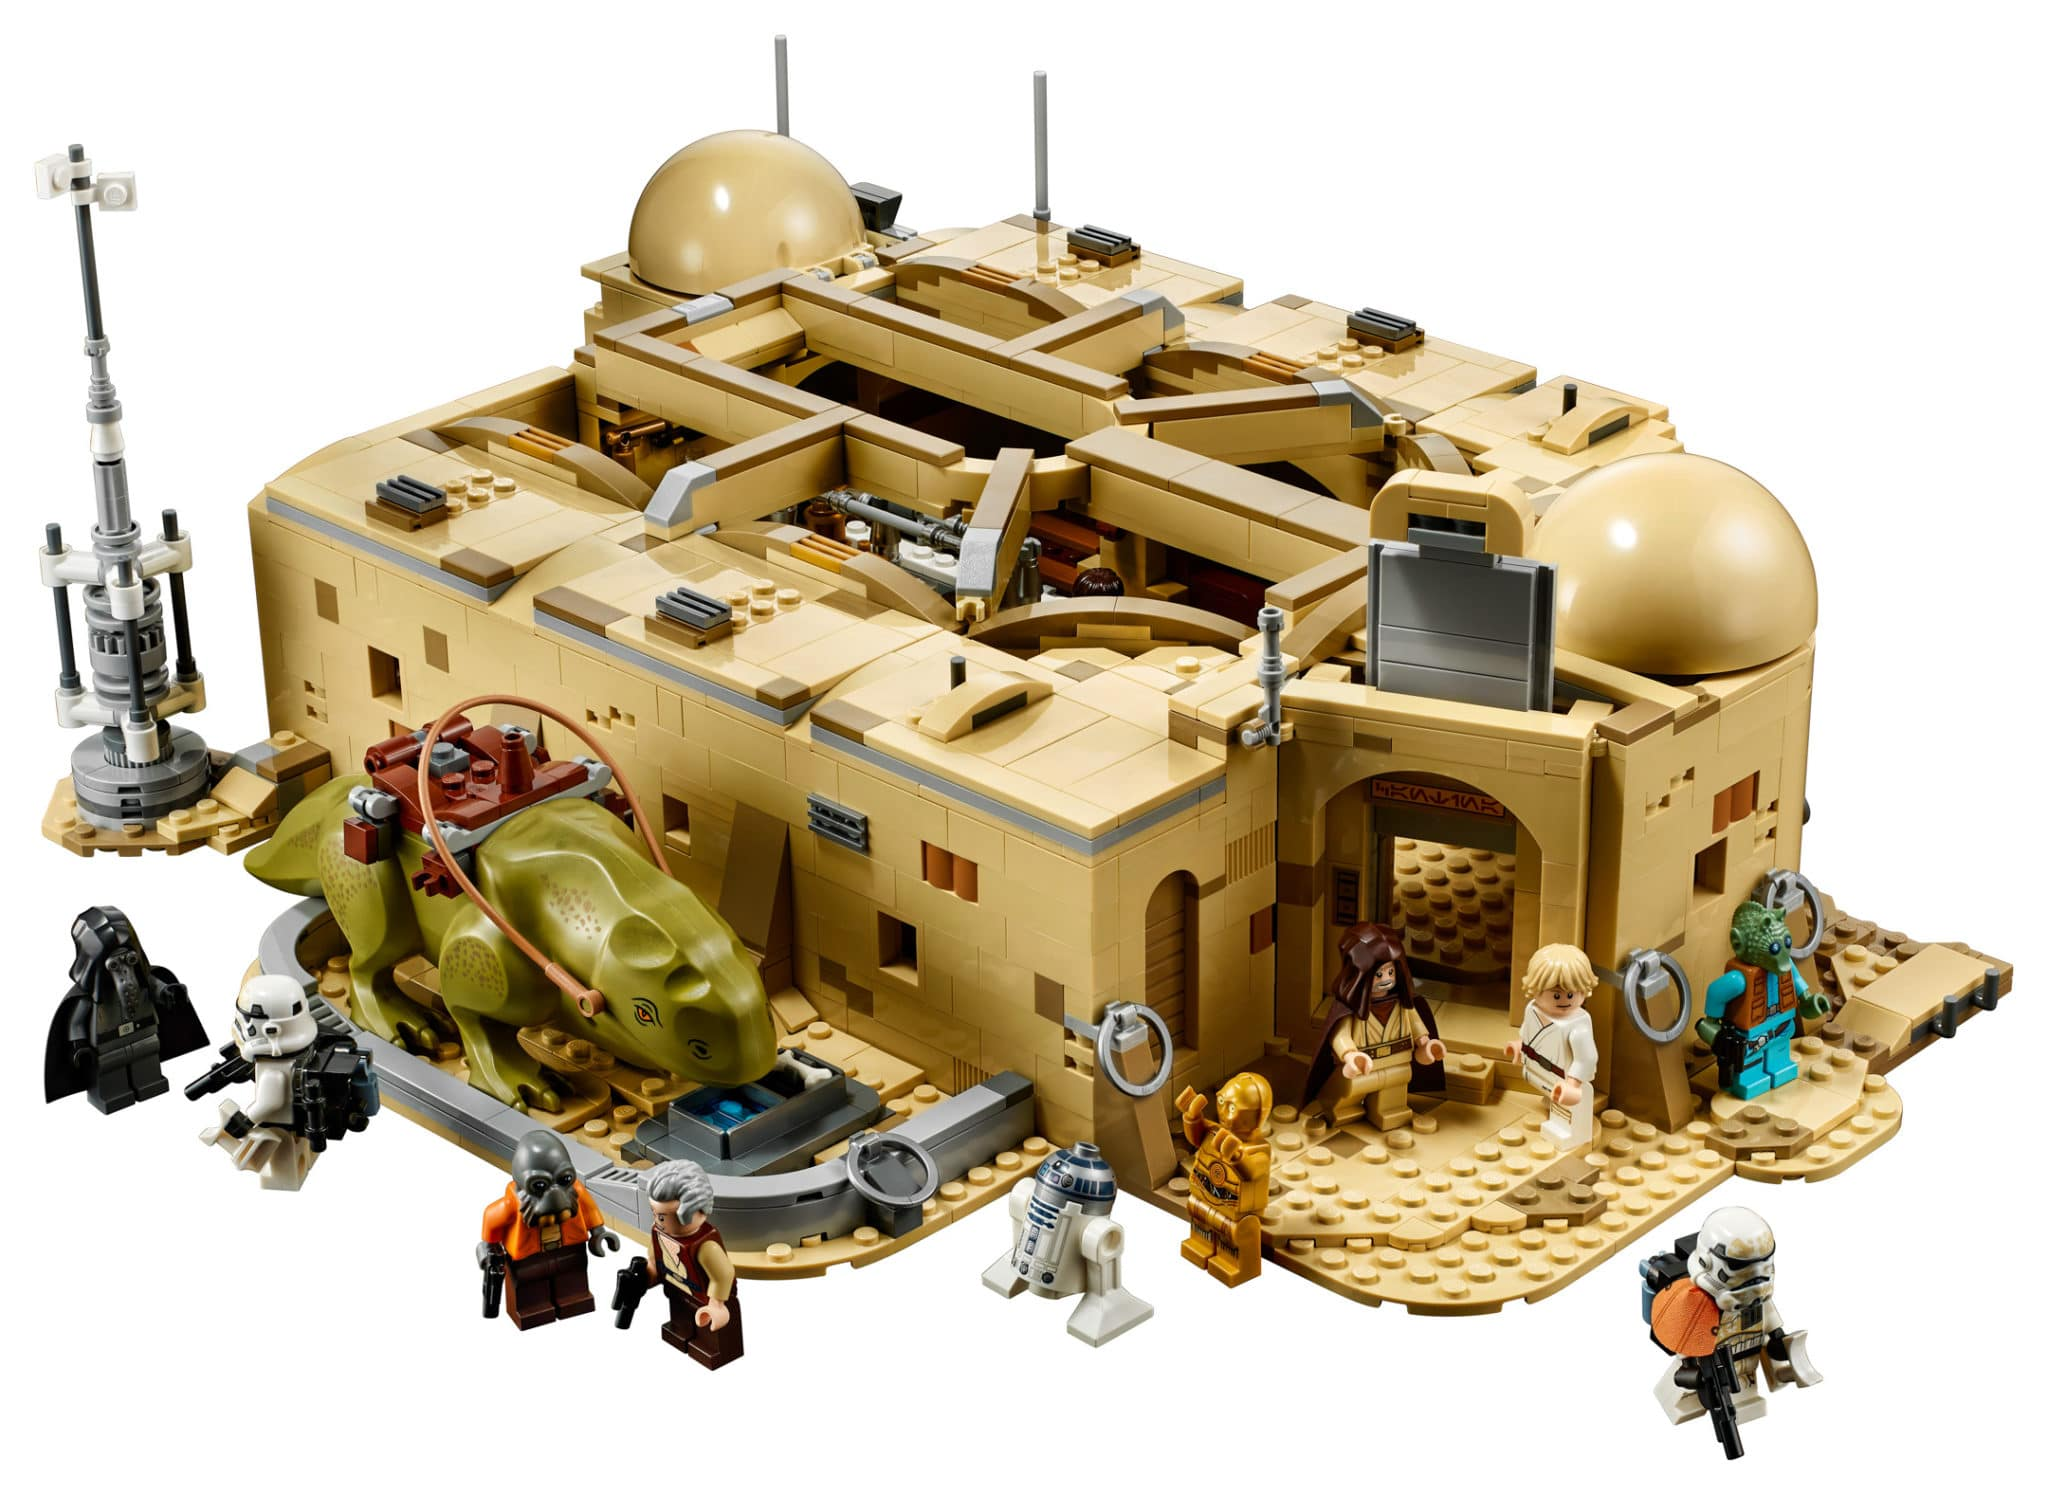 LEGO Star Wars 75290 Mos Eisley Cantina (3)